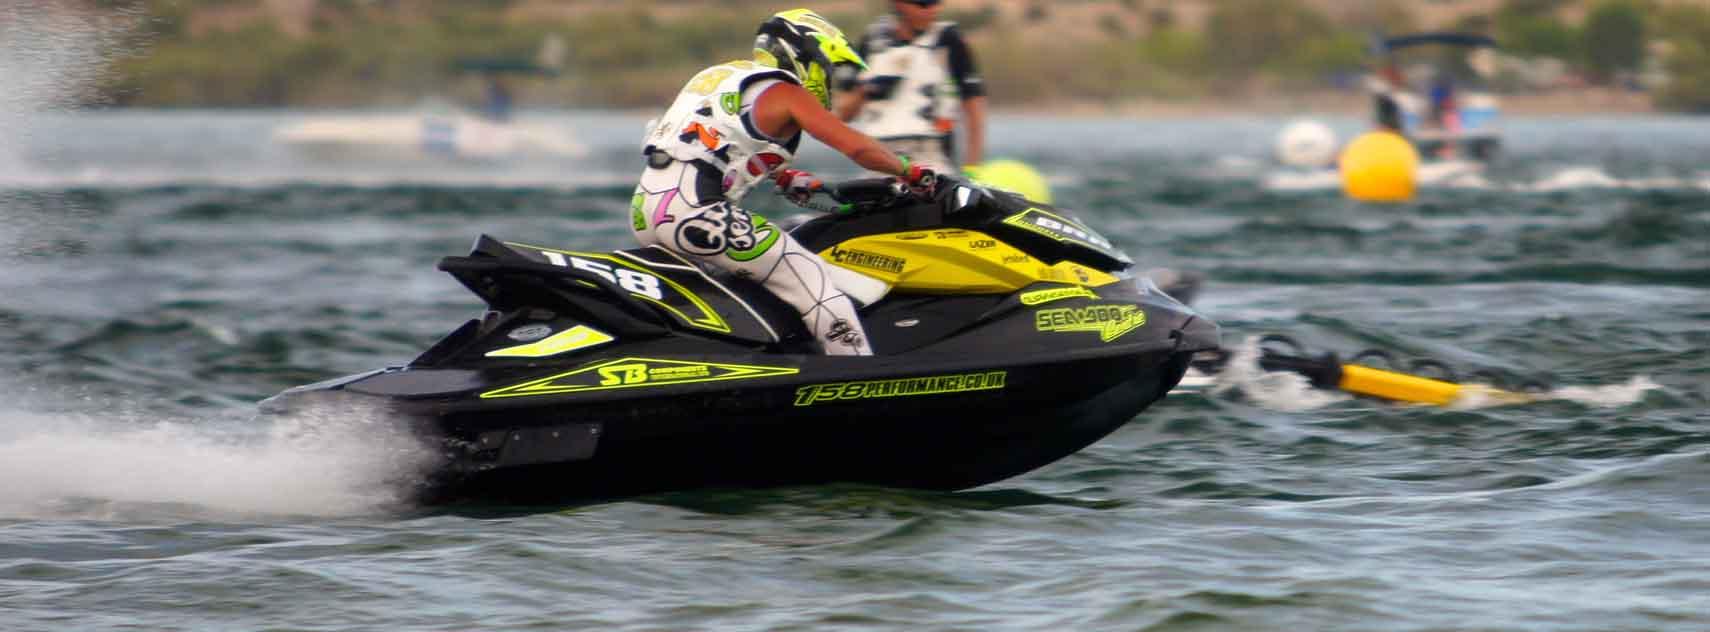 Sea Doo Jet Ski For Sale >> best racing jet ski | Sea-Doo Onboard